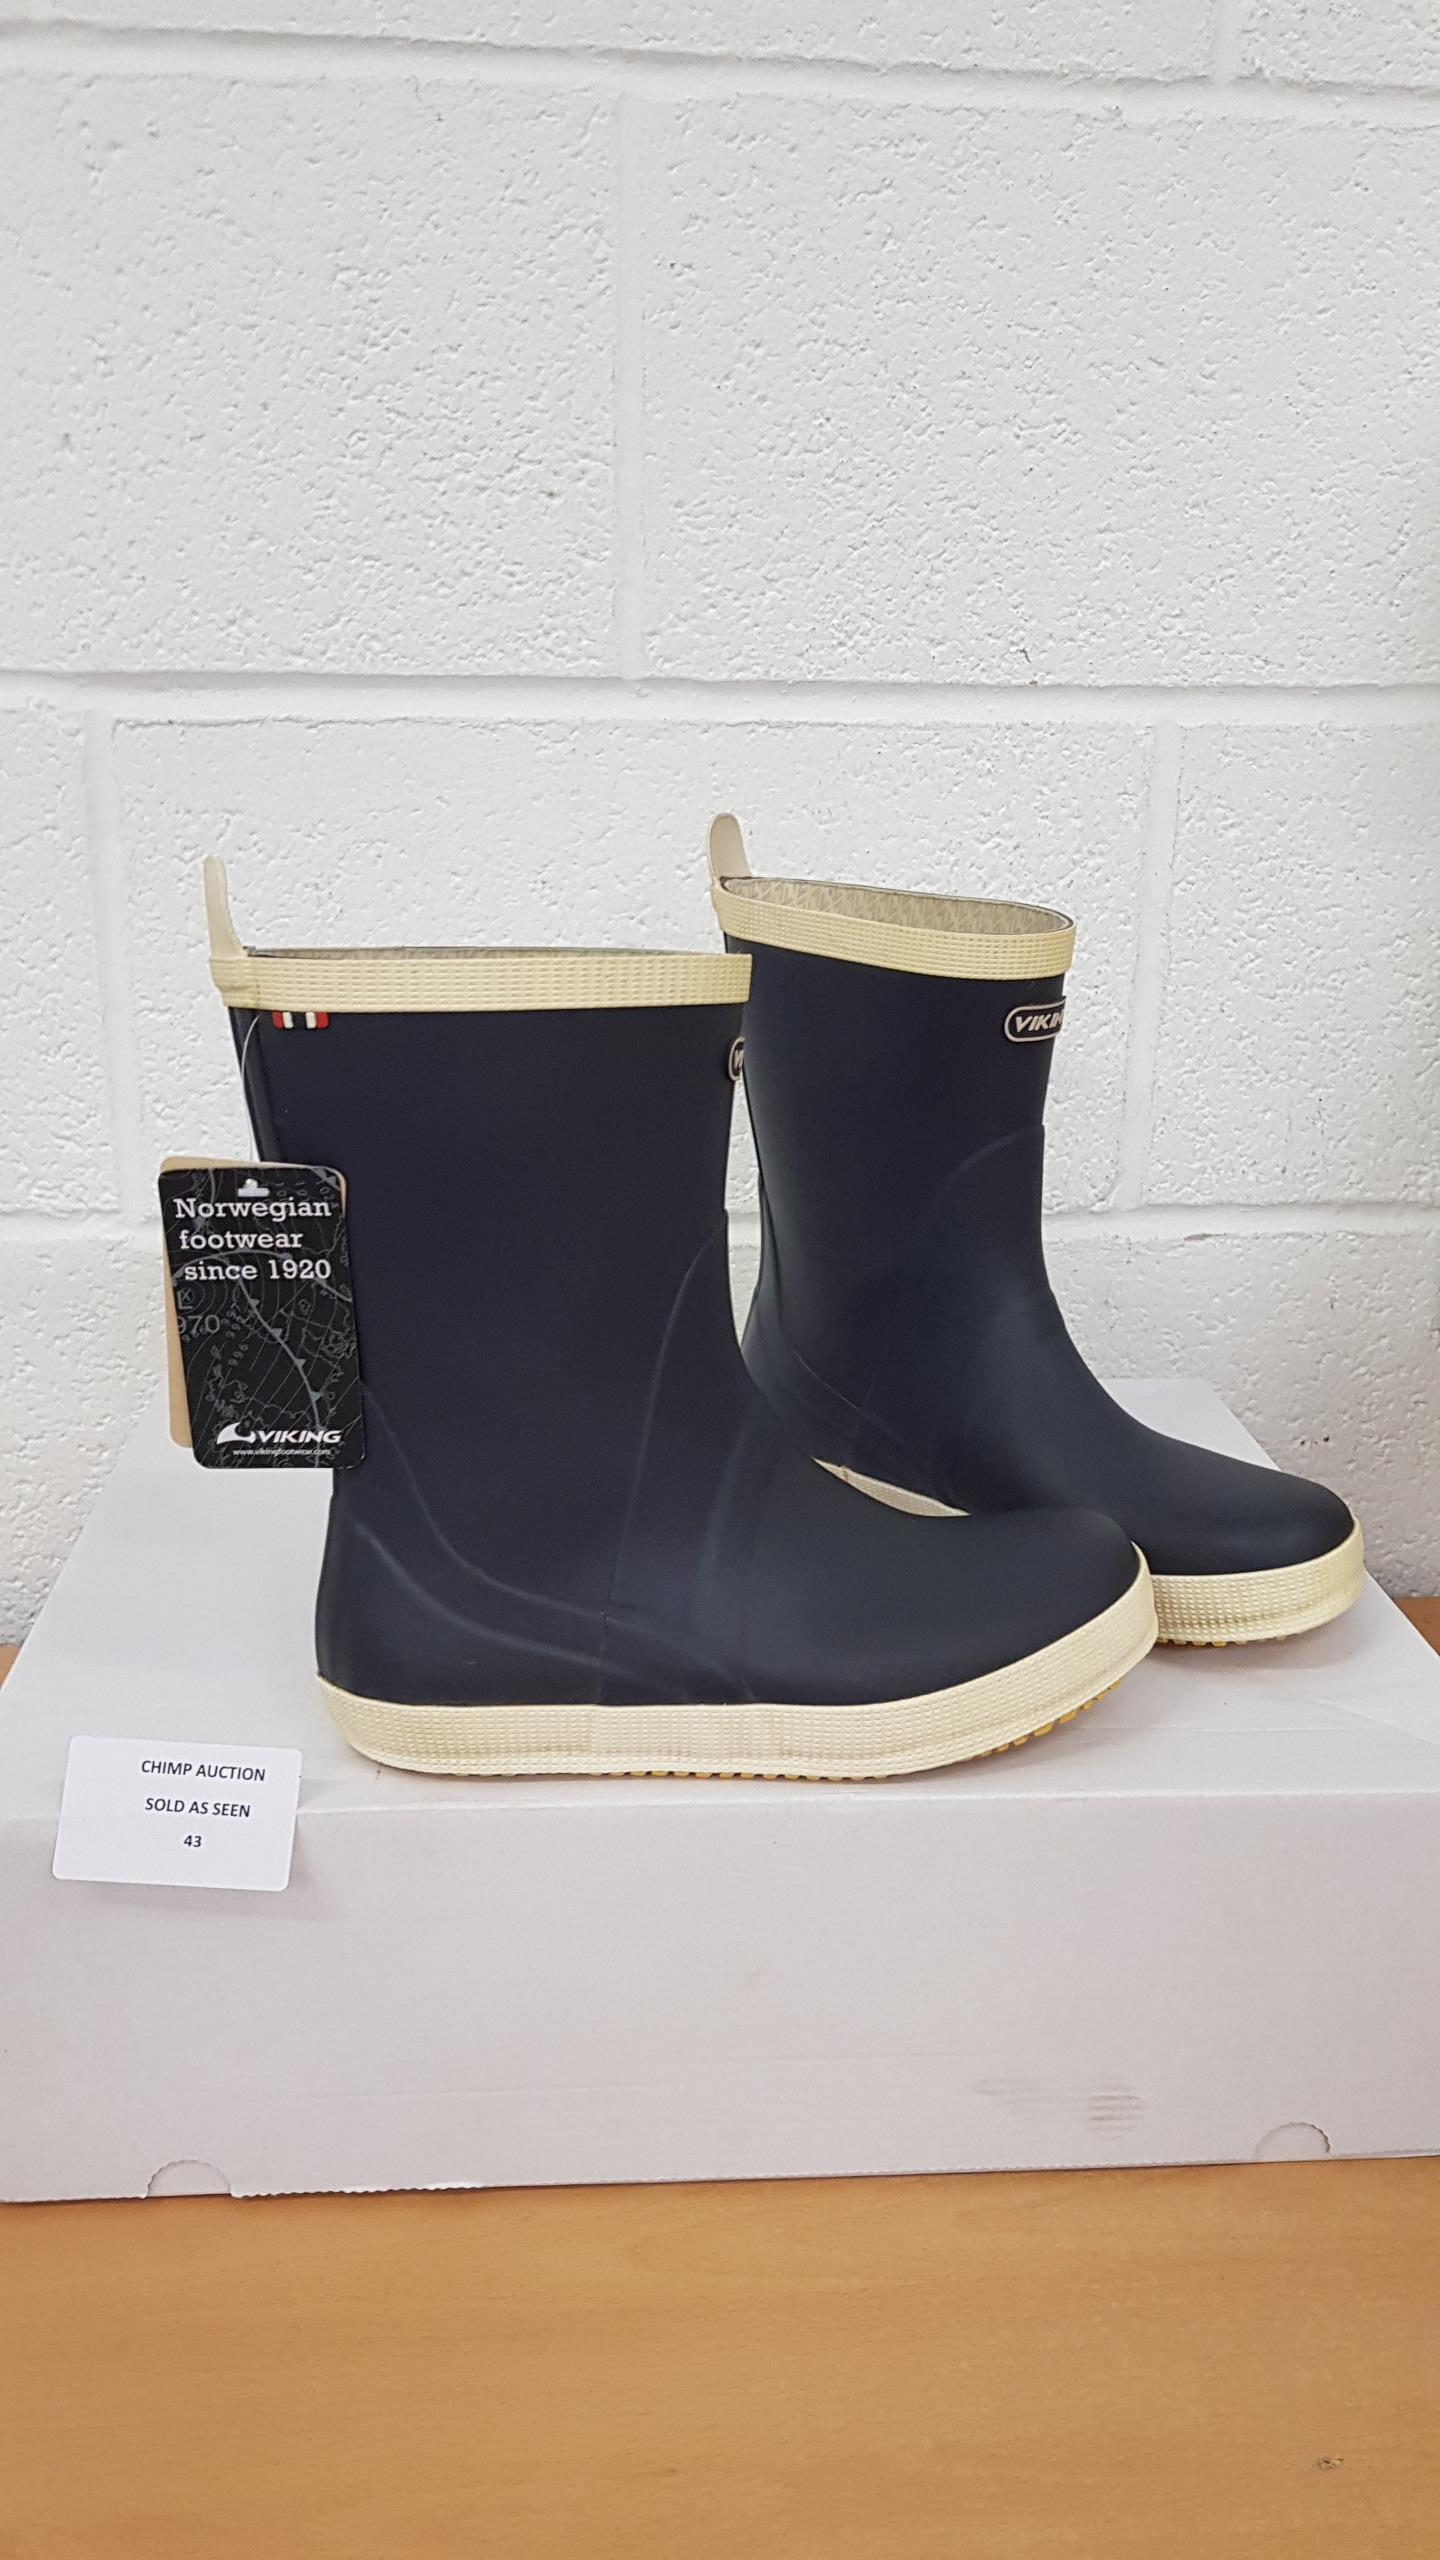 Lot 43 - Viking Seilas, Unisex Adults' Boots EU 38 RRP £59.99